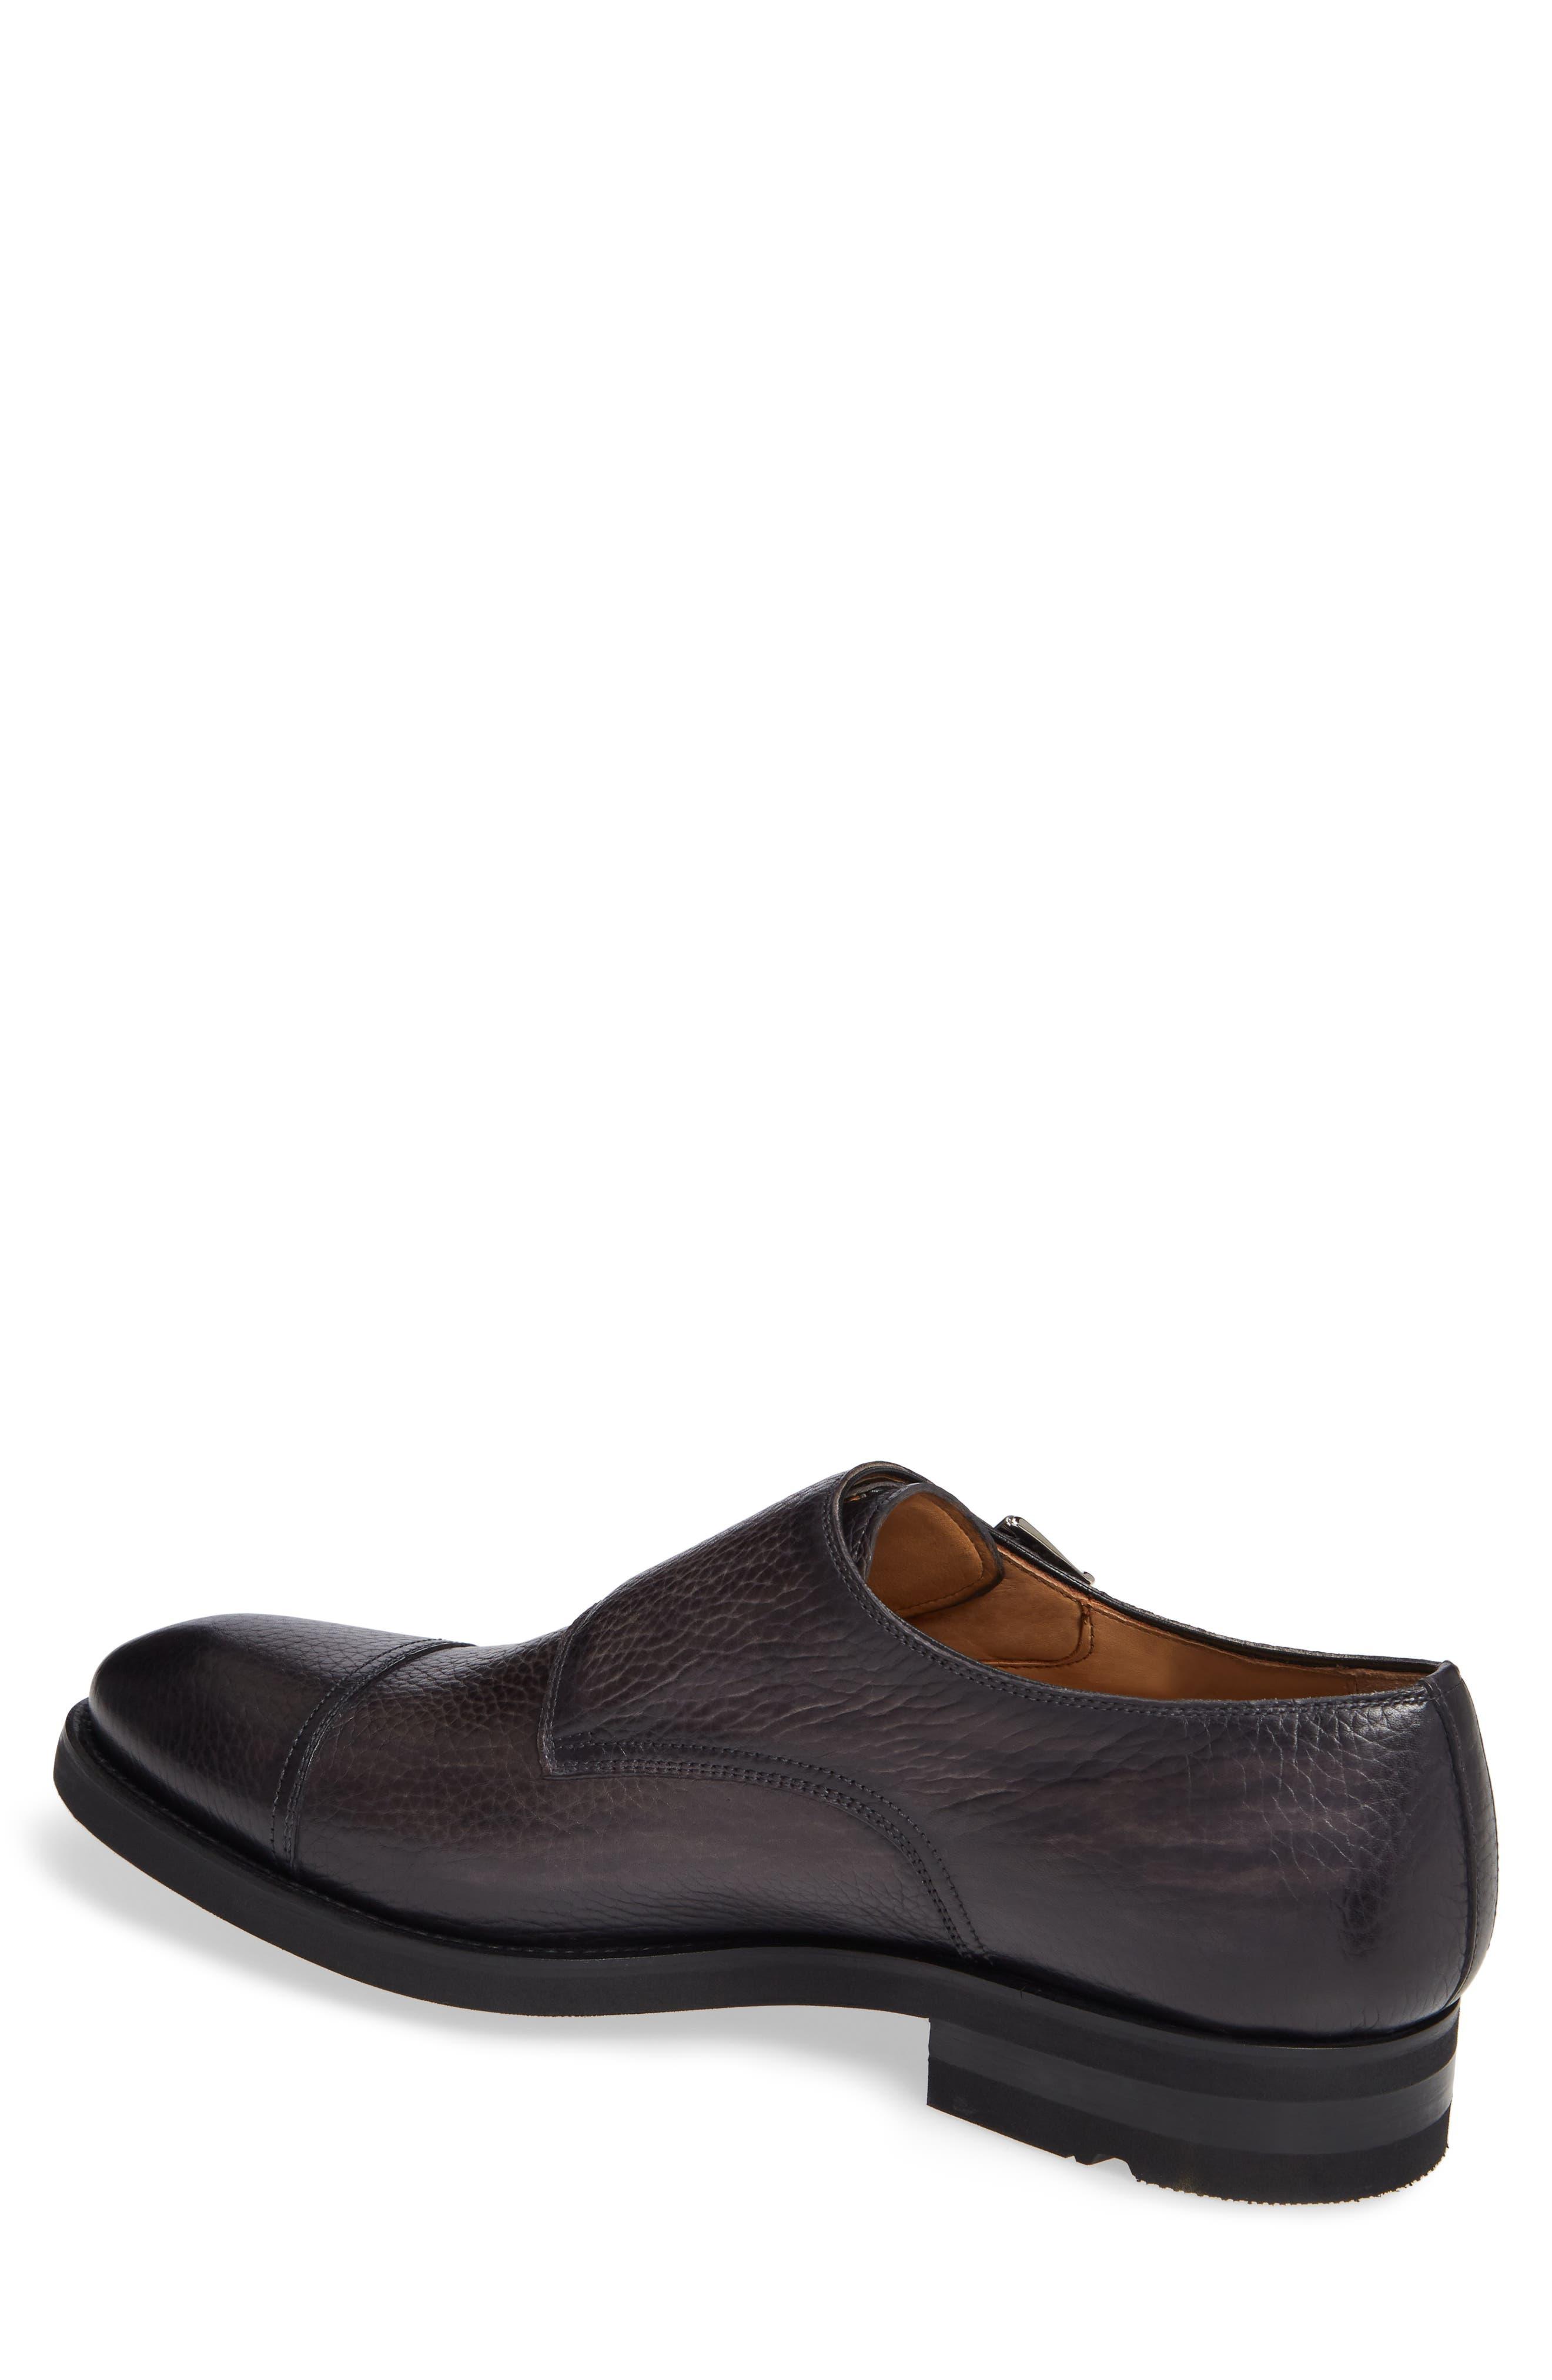 Jebor Double Monk Strap Shoe,                             Alternate thumbnail 2, color,                             GREY